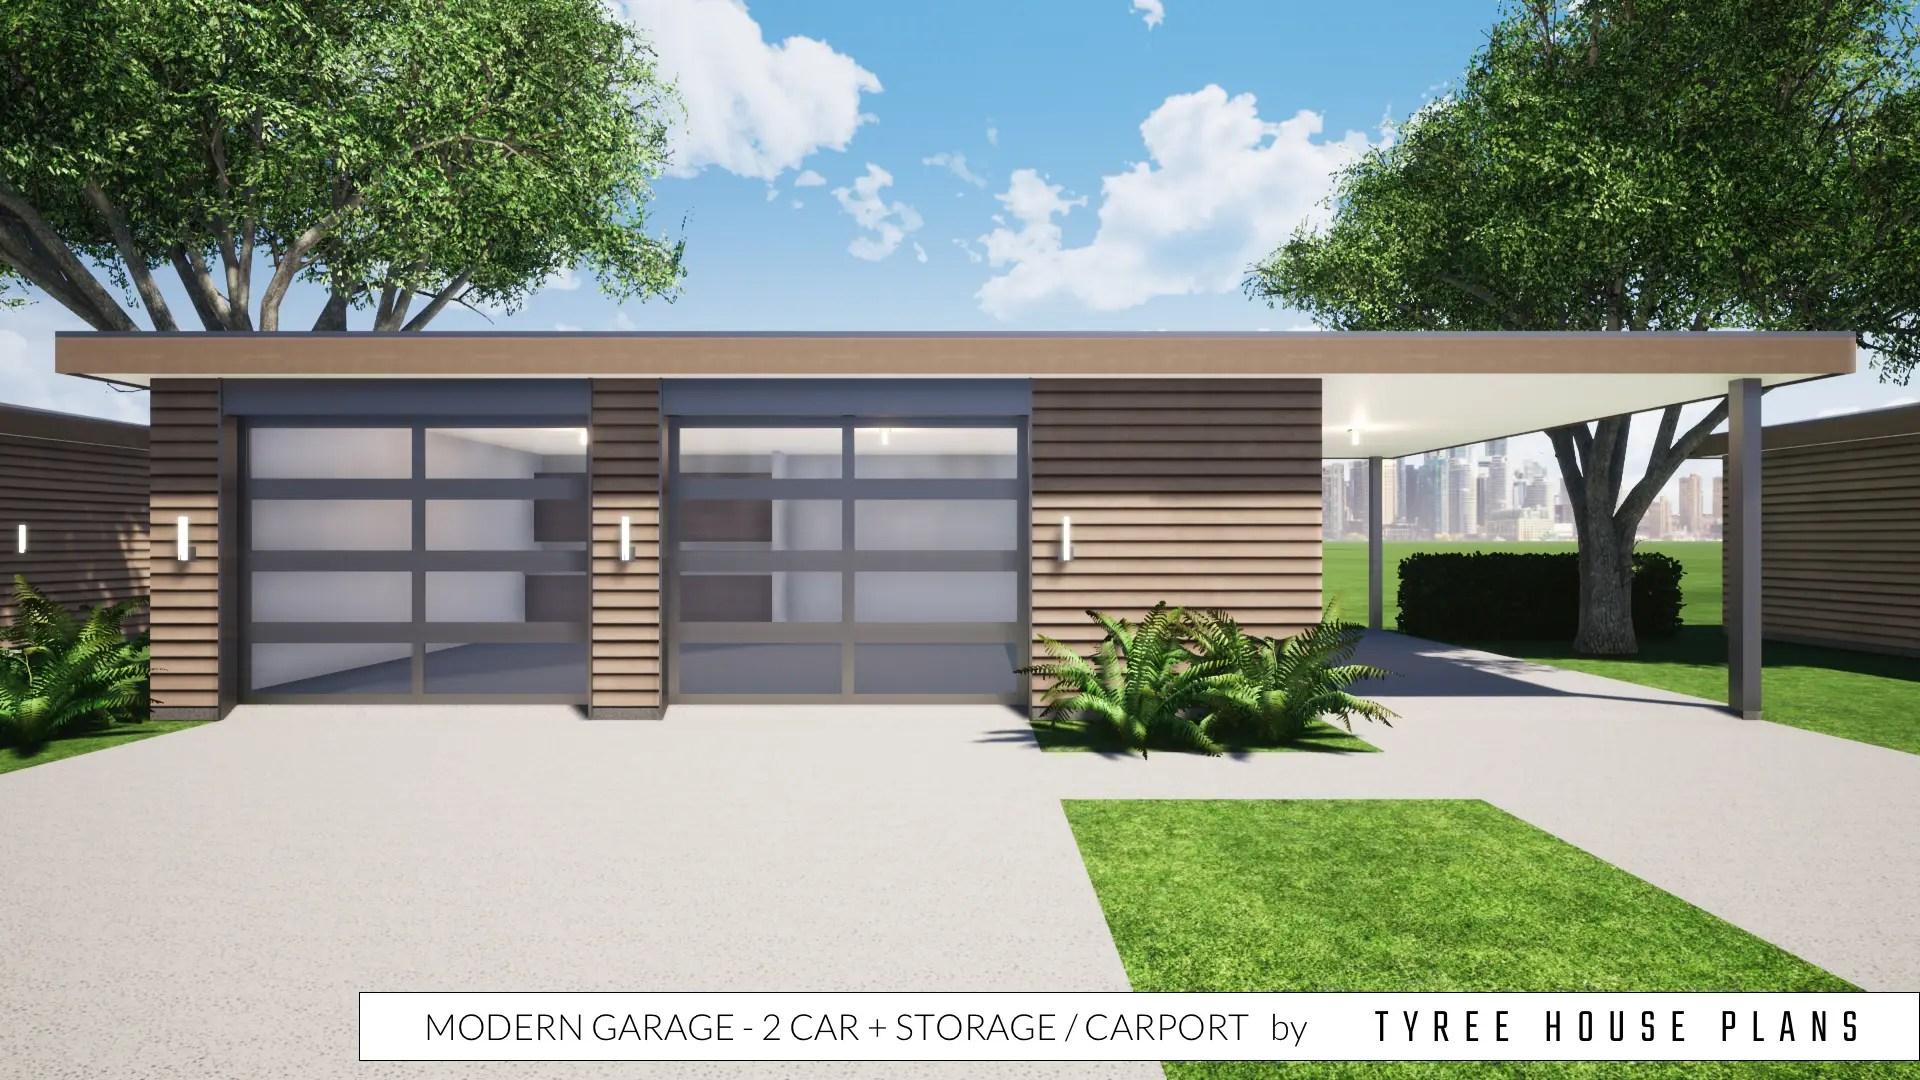 Modern Garage Plan 2 Car Plus Storage And Carport By Tyree House